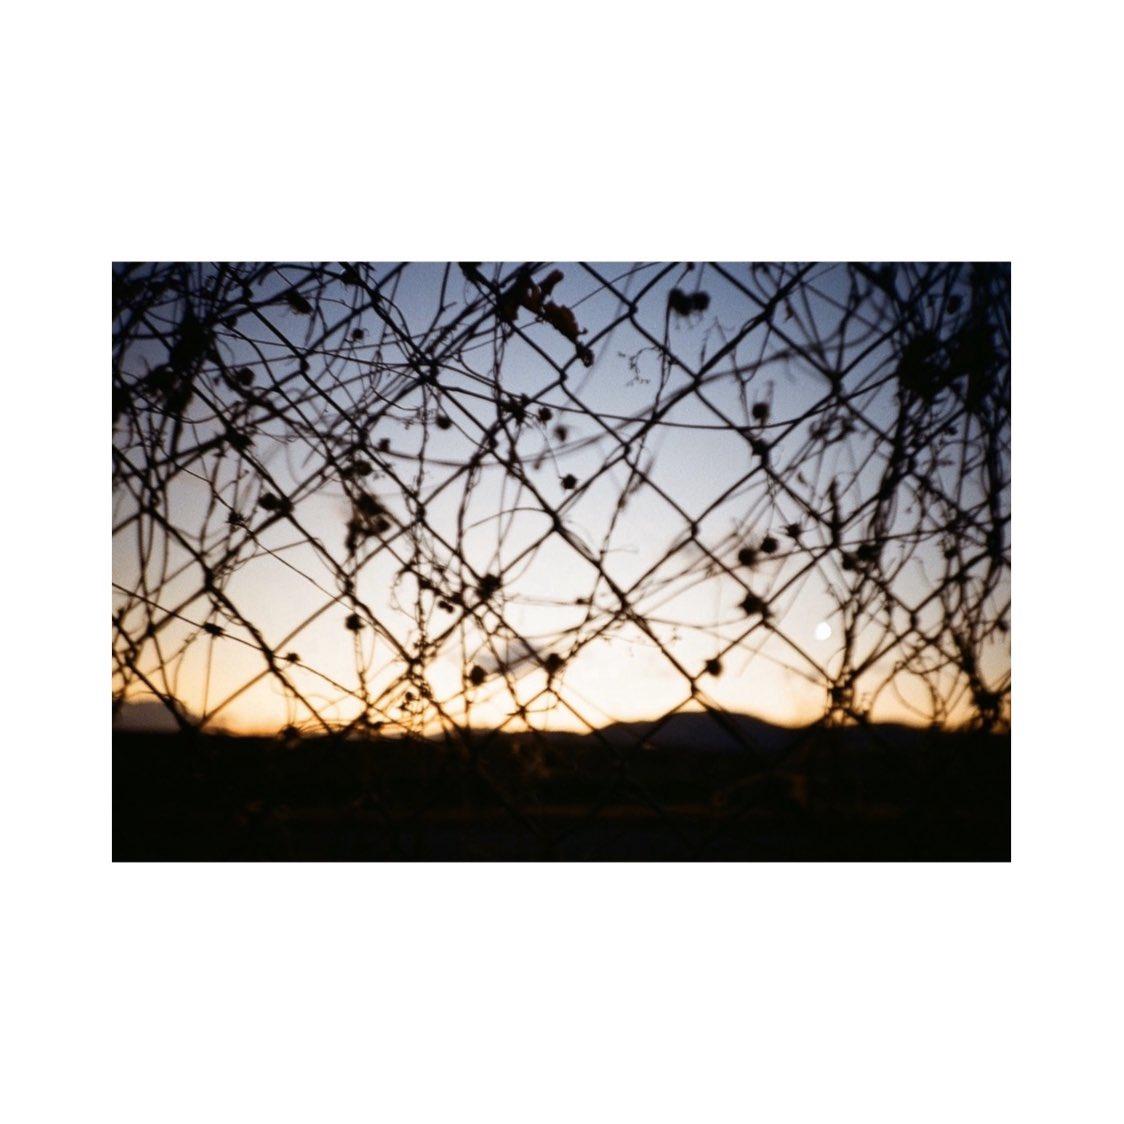 #lca #lomo #lomography #lomographyfilm #film #filmcamera #filmphotography #instagram #instagramjapan #tokyocameraclub #sky #skylovers #skyblue #bluesky #whiteclouds #solar #wind #light #shadows #myworld